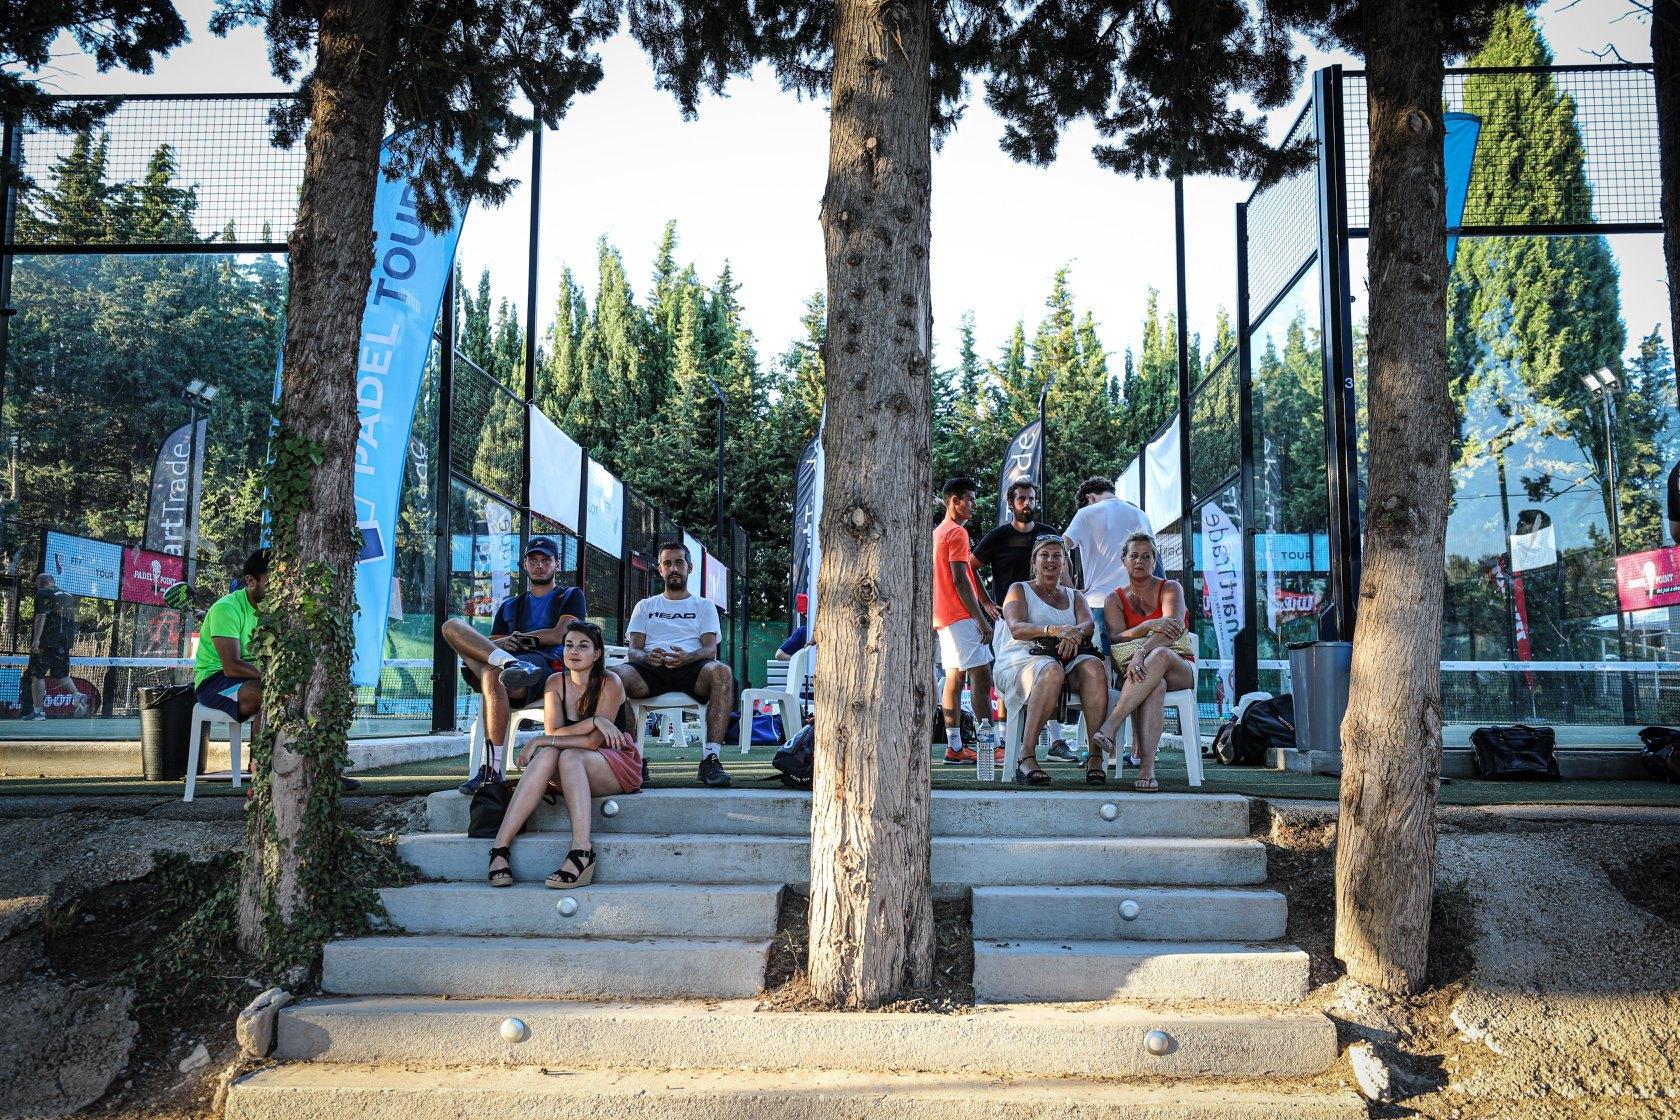 FFT PADEL TOUR Aix-en-Provence - Le potenziali grandi partite